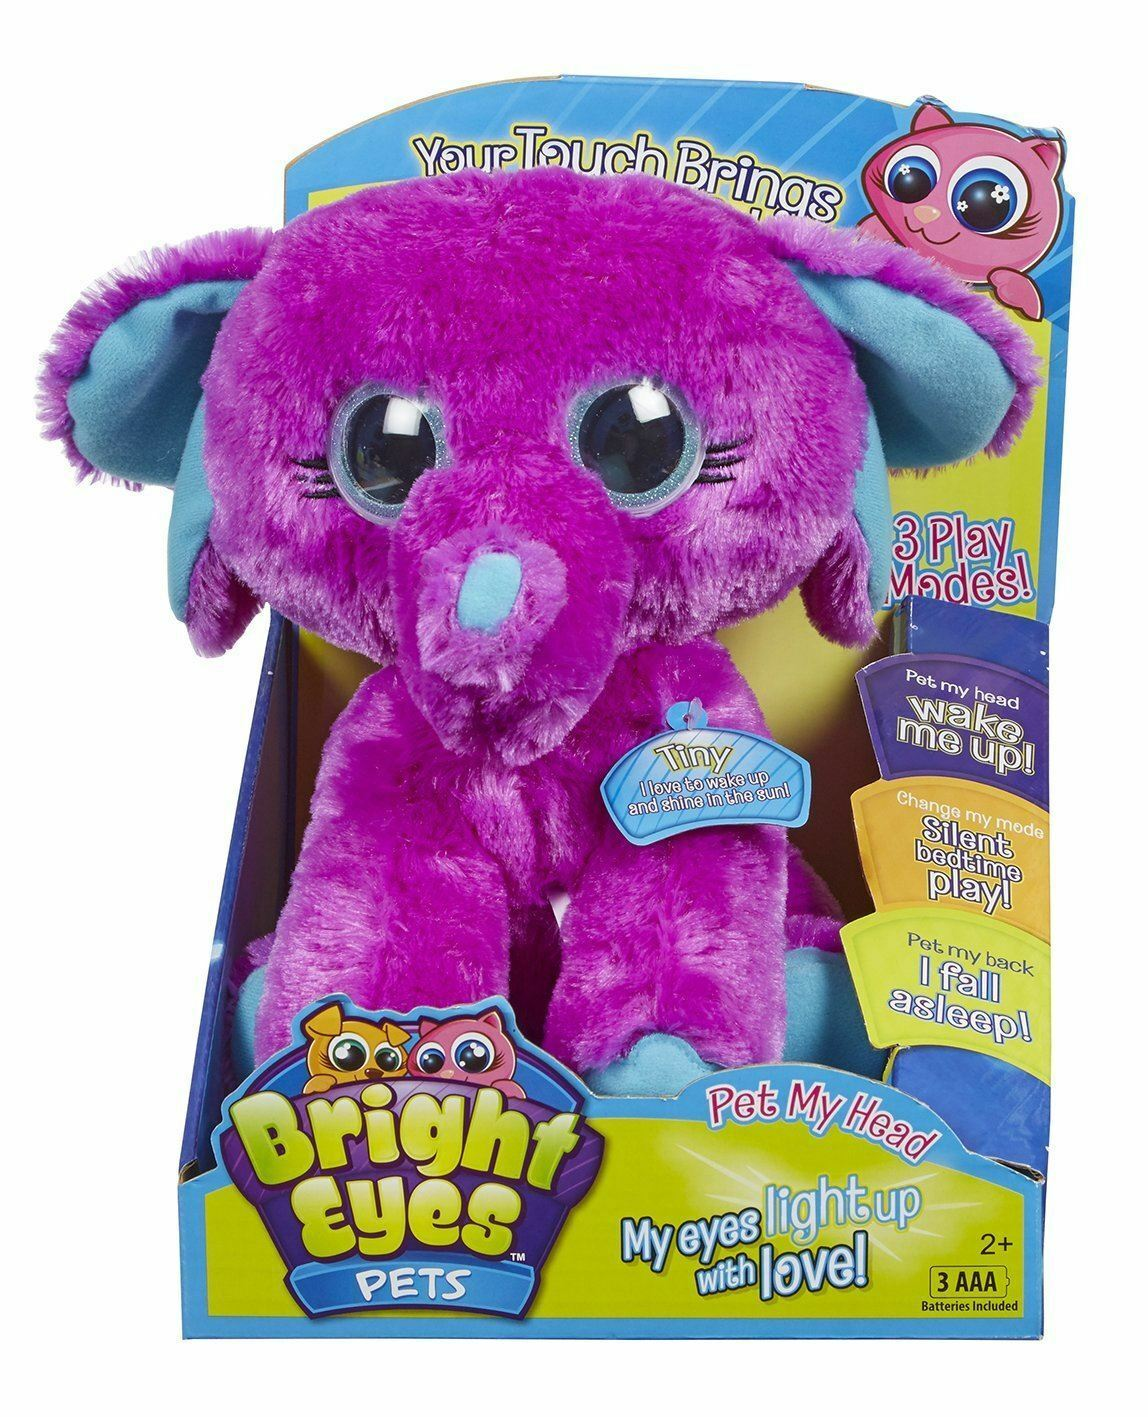 Bright Eyes Pets - TINY The ELEPHANT - Plush Interactive Toy  - NEW